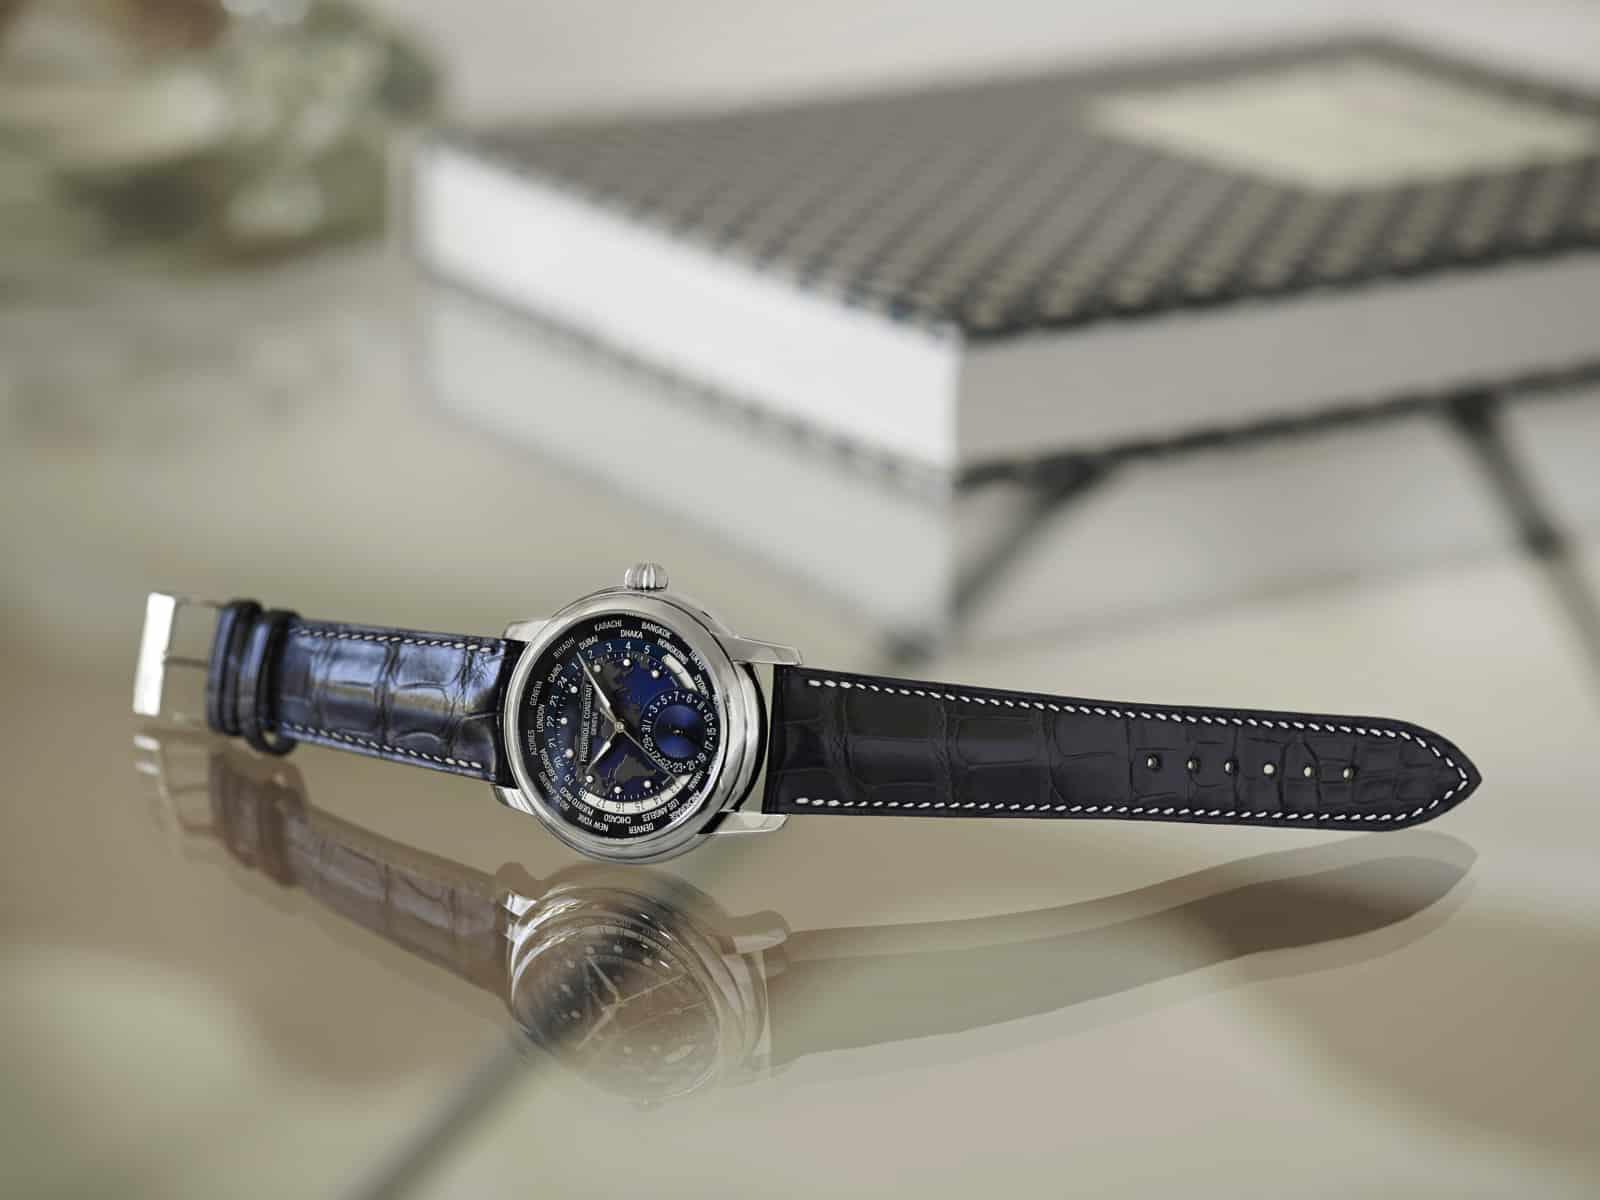 Frederique-Consant-Manufacture-Worldtimer-Blue-Ref-FC-718NWM4H6-thumb-1600x1200-25050